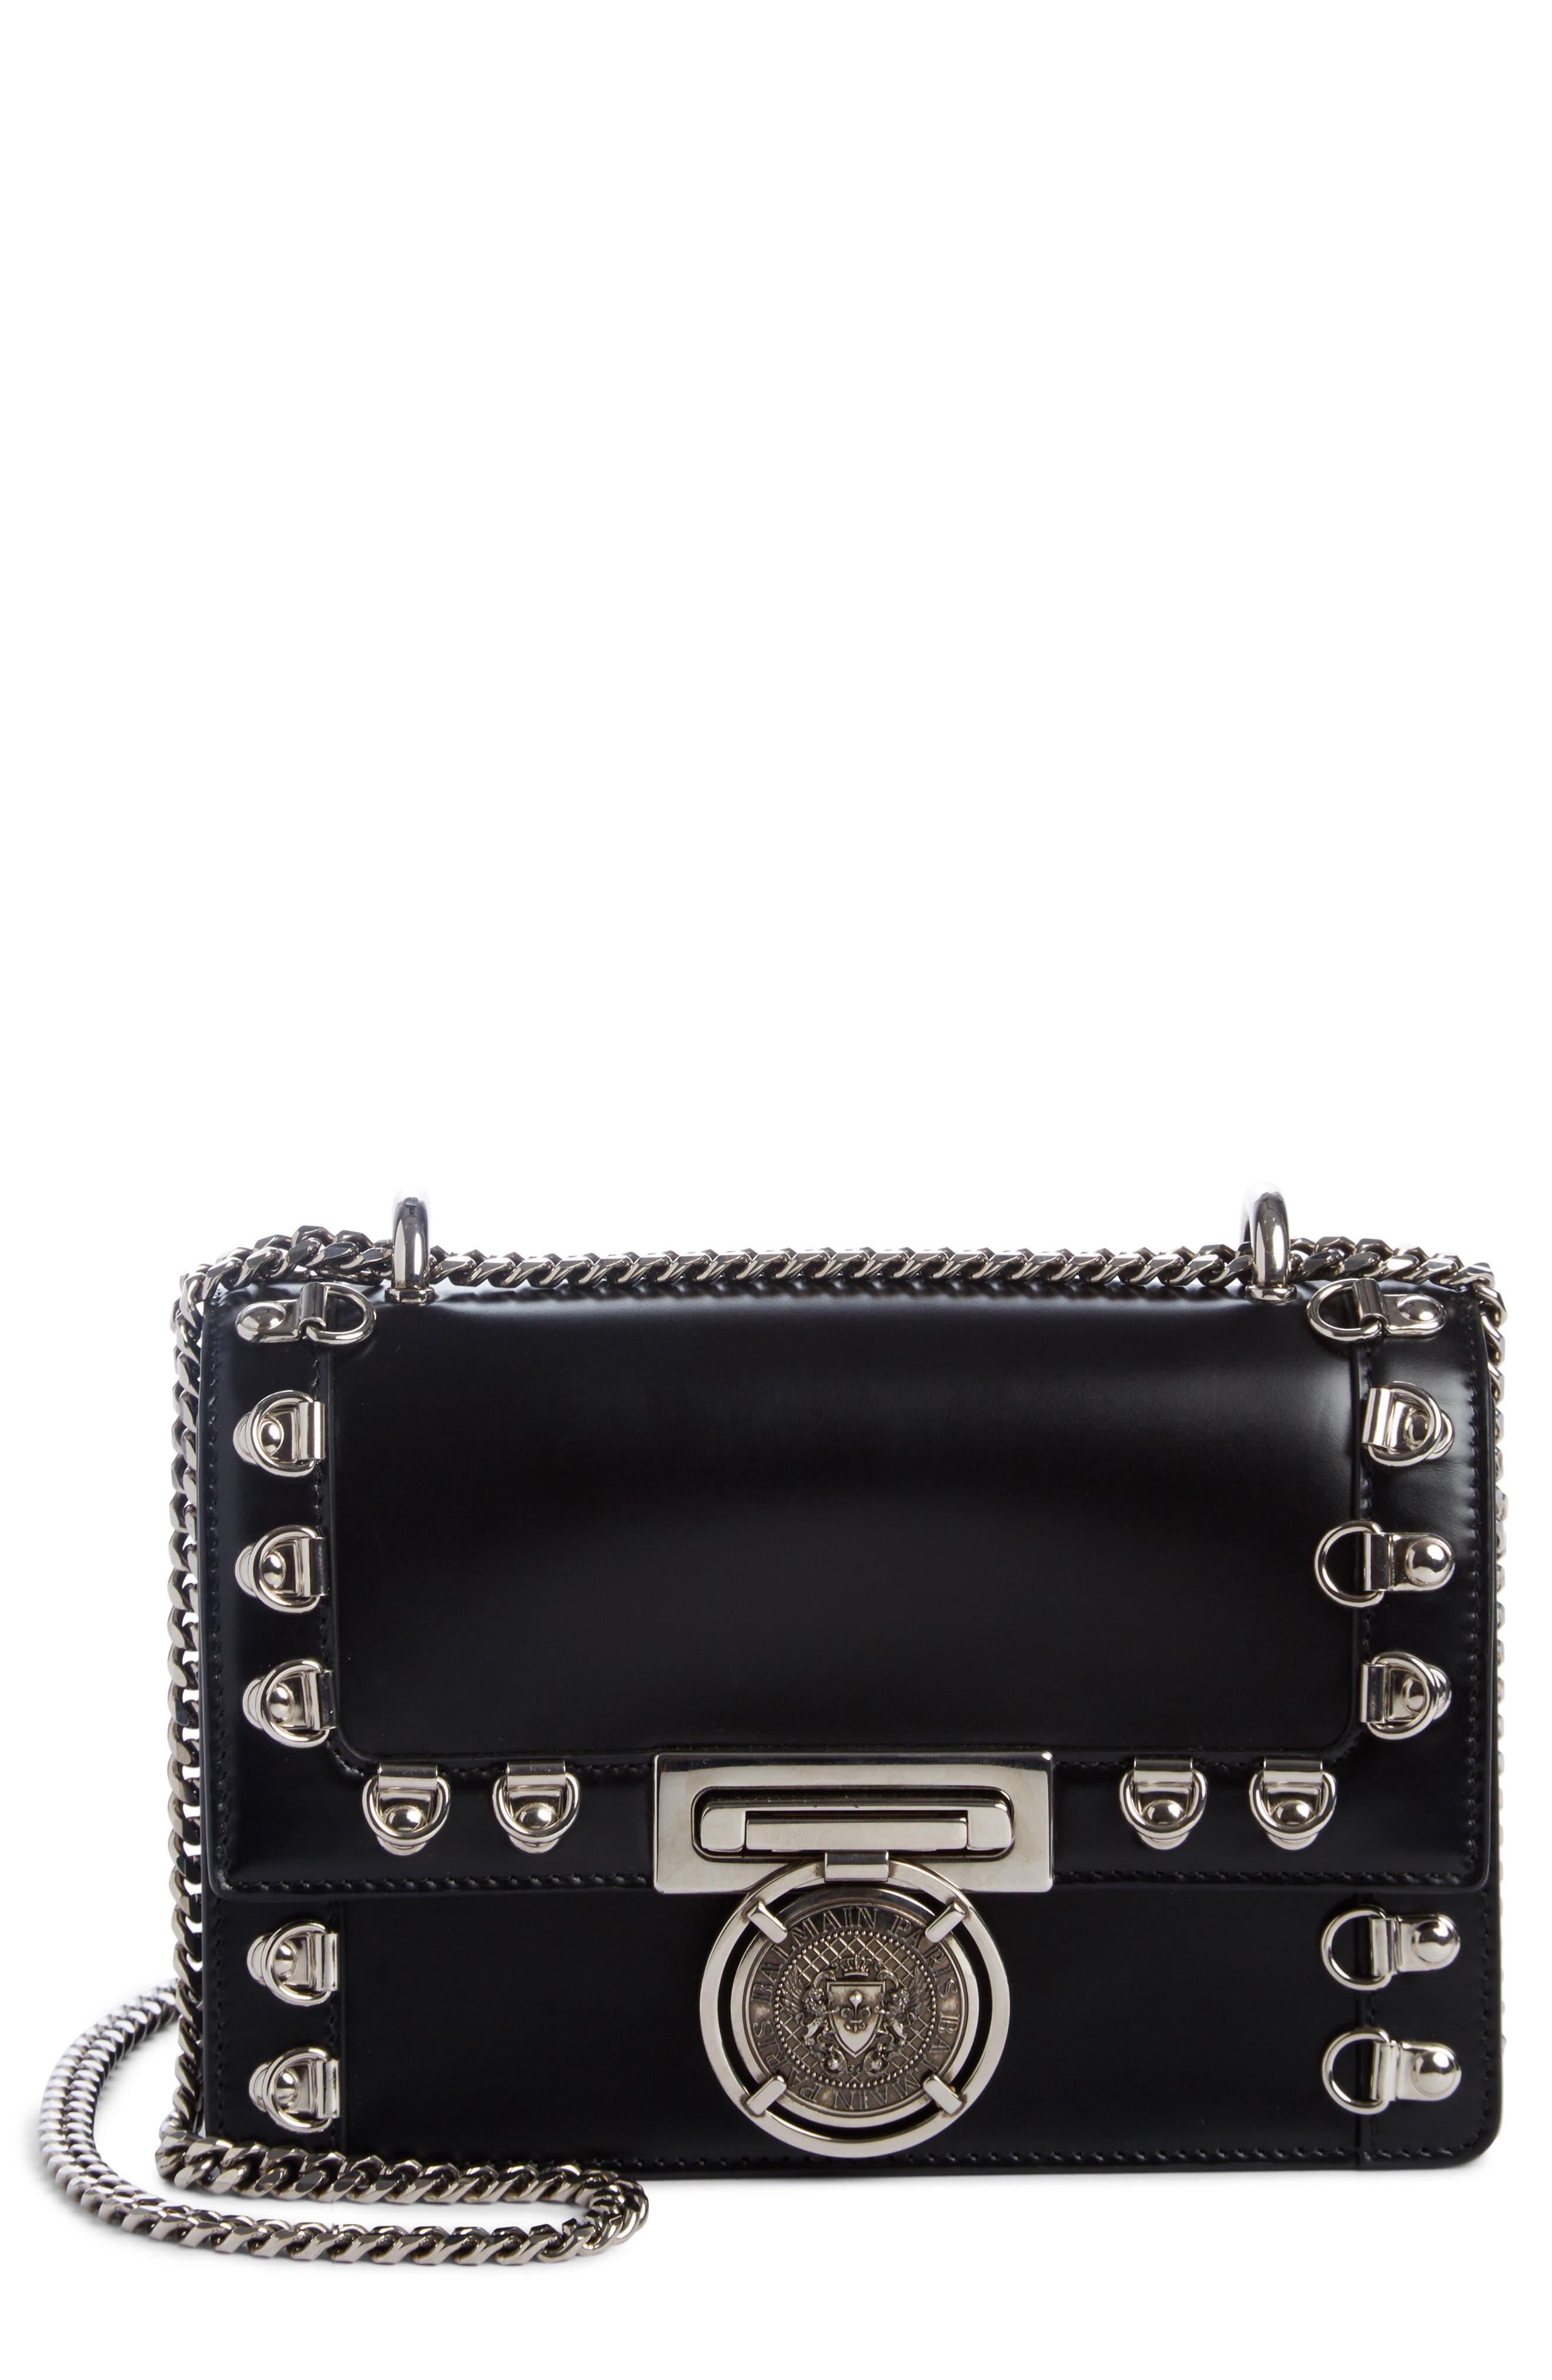 Alternate Image 1 Selected - Balmain Stud Glace Leather Box Shoulder Bag